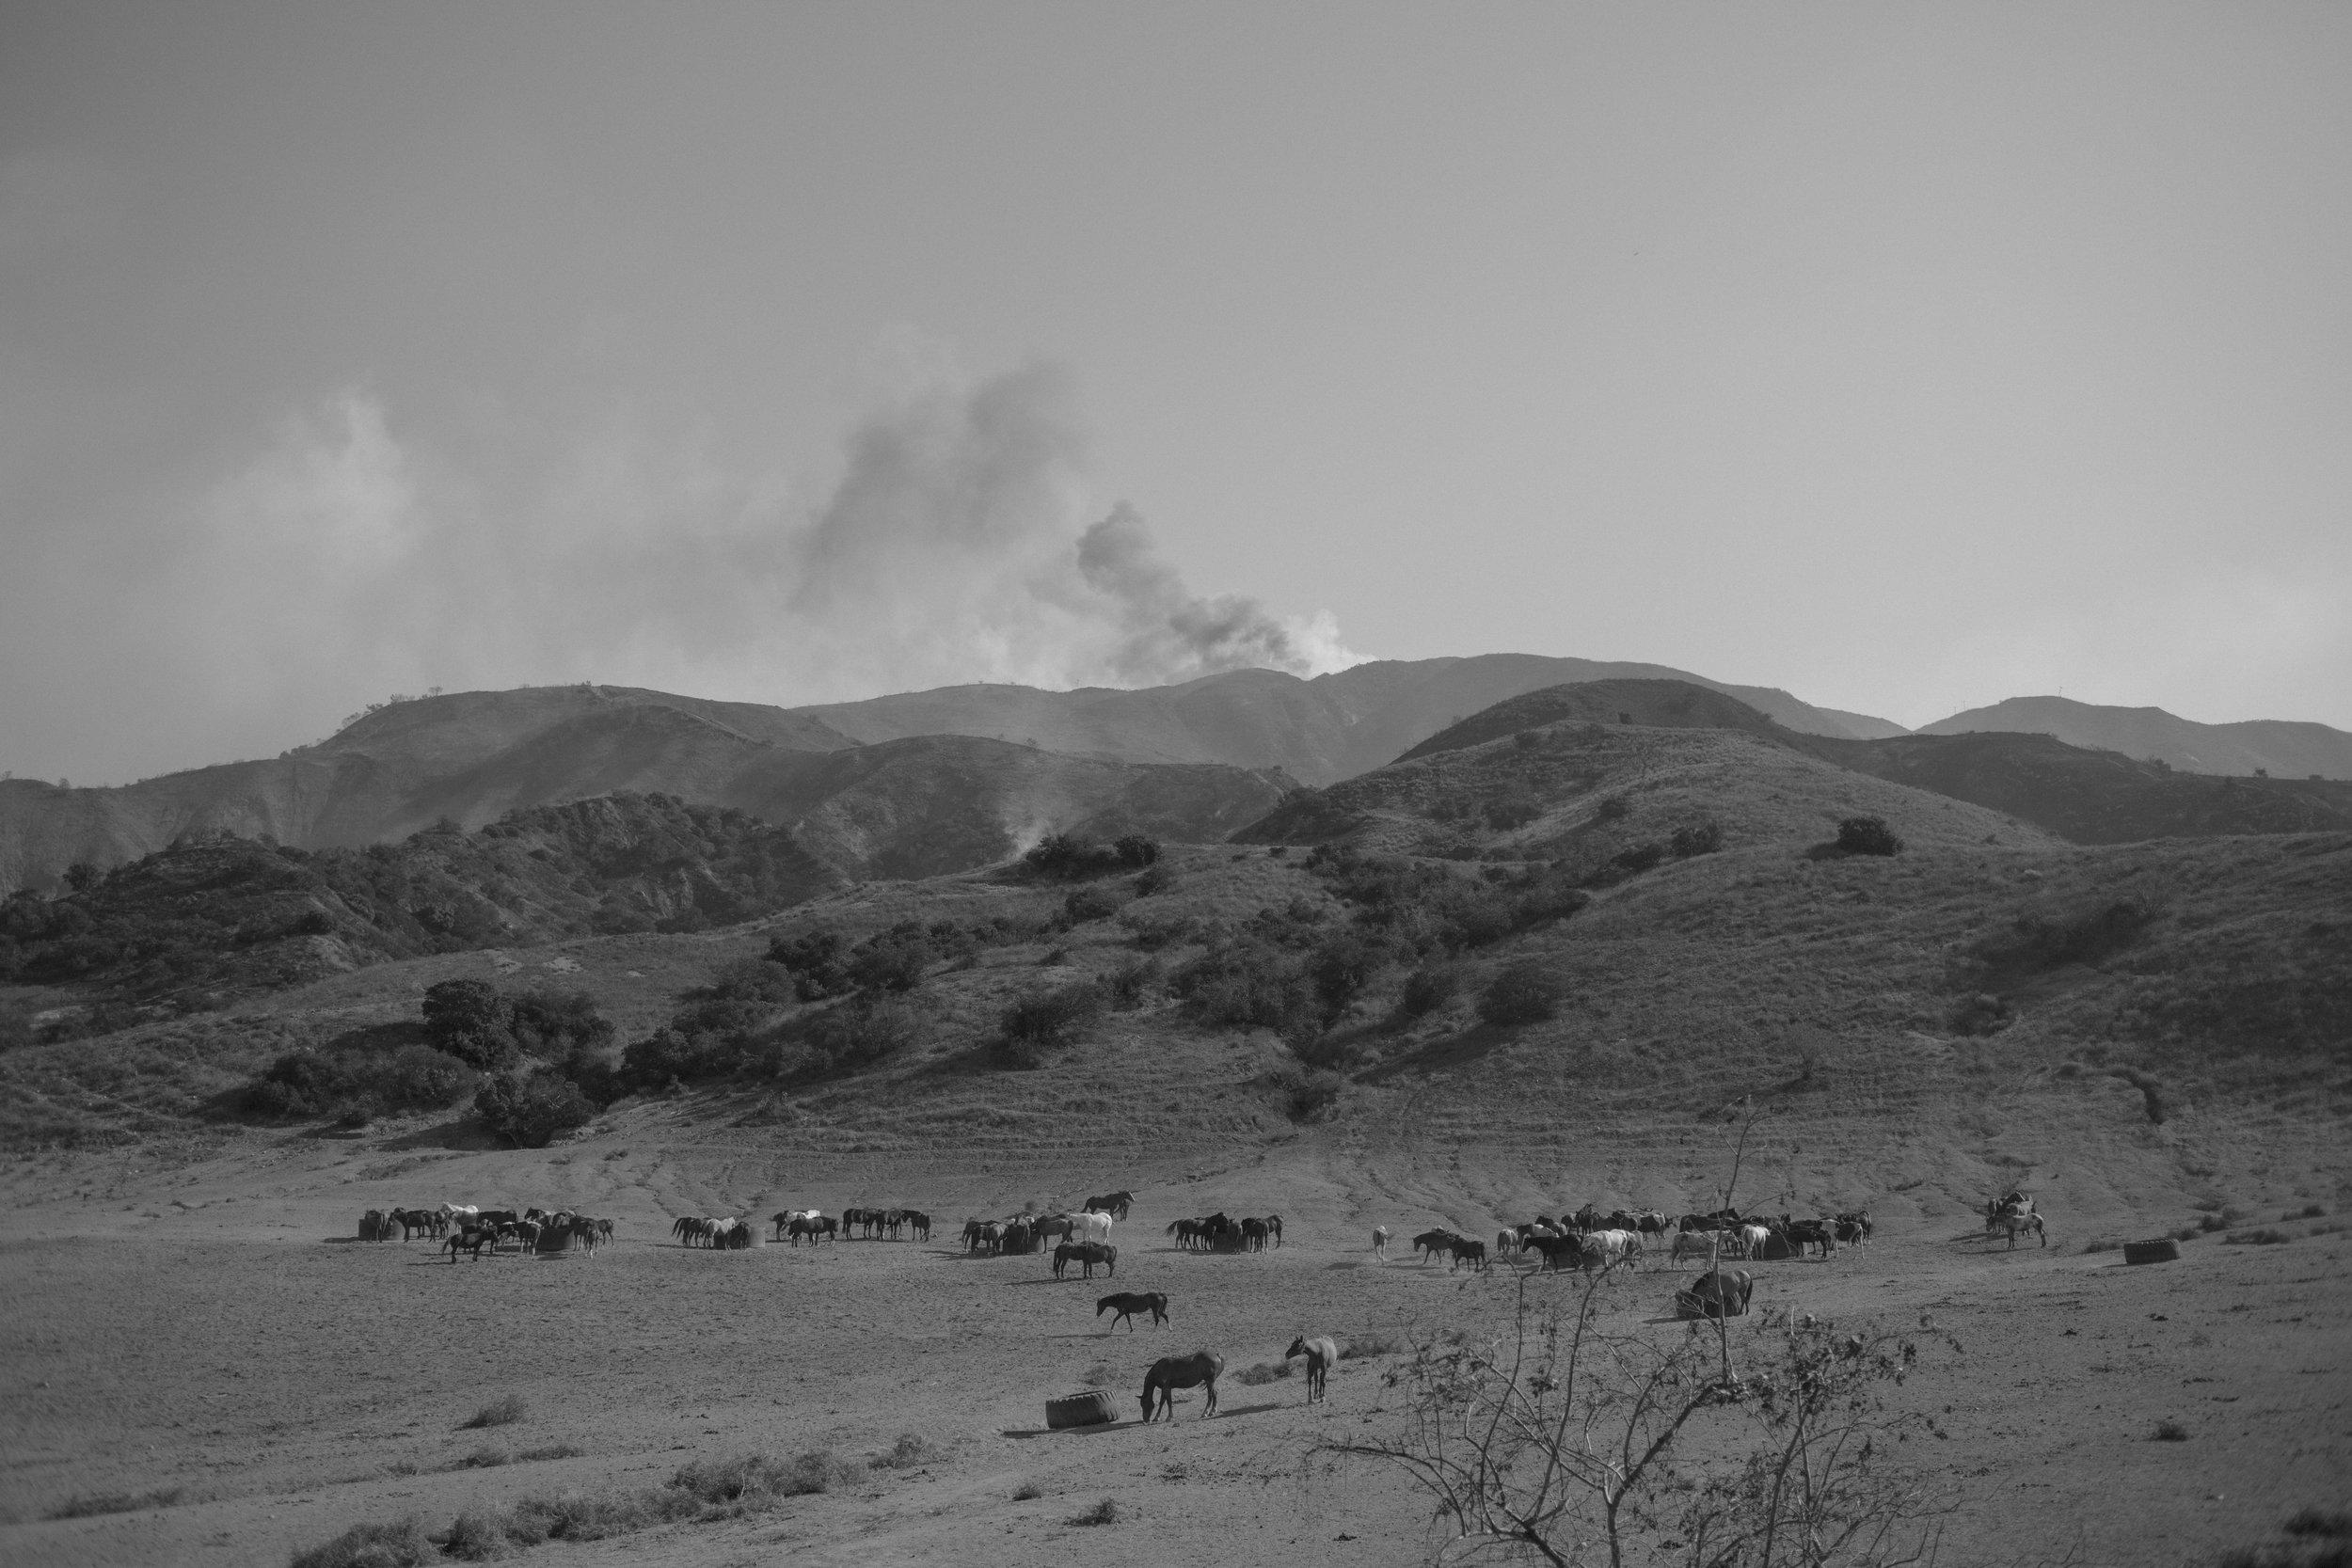 12_KoviKonowiecki_Brush Fire, Corona.jpg